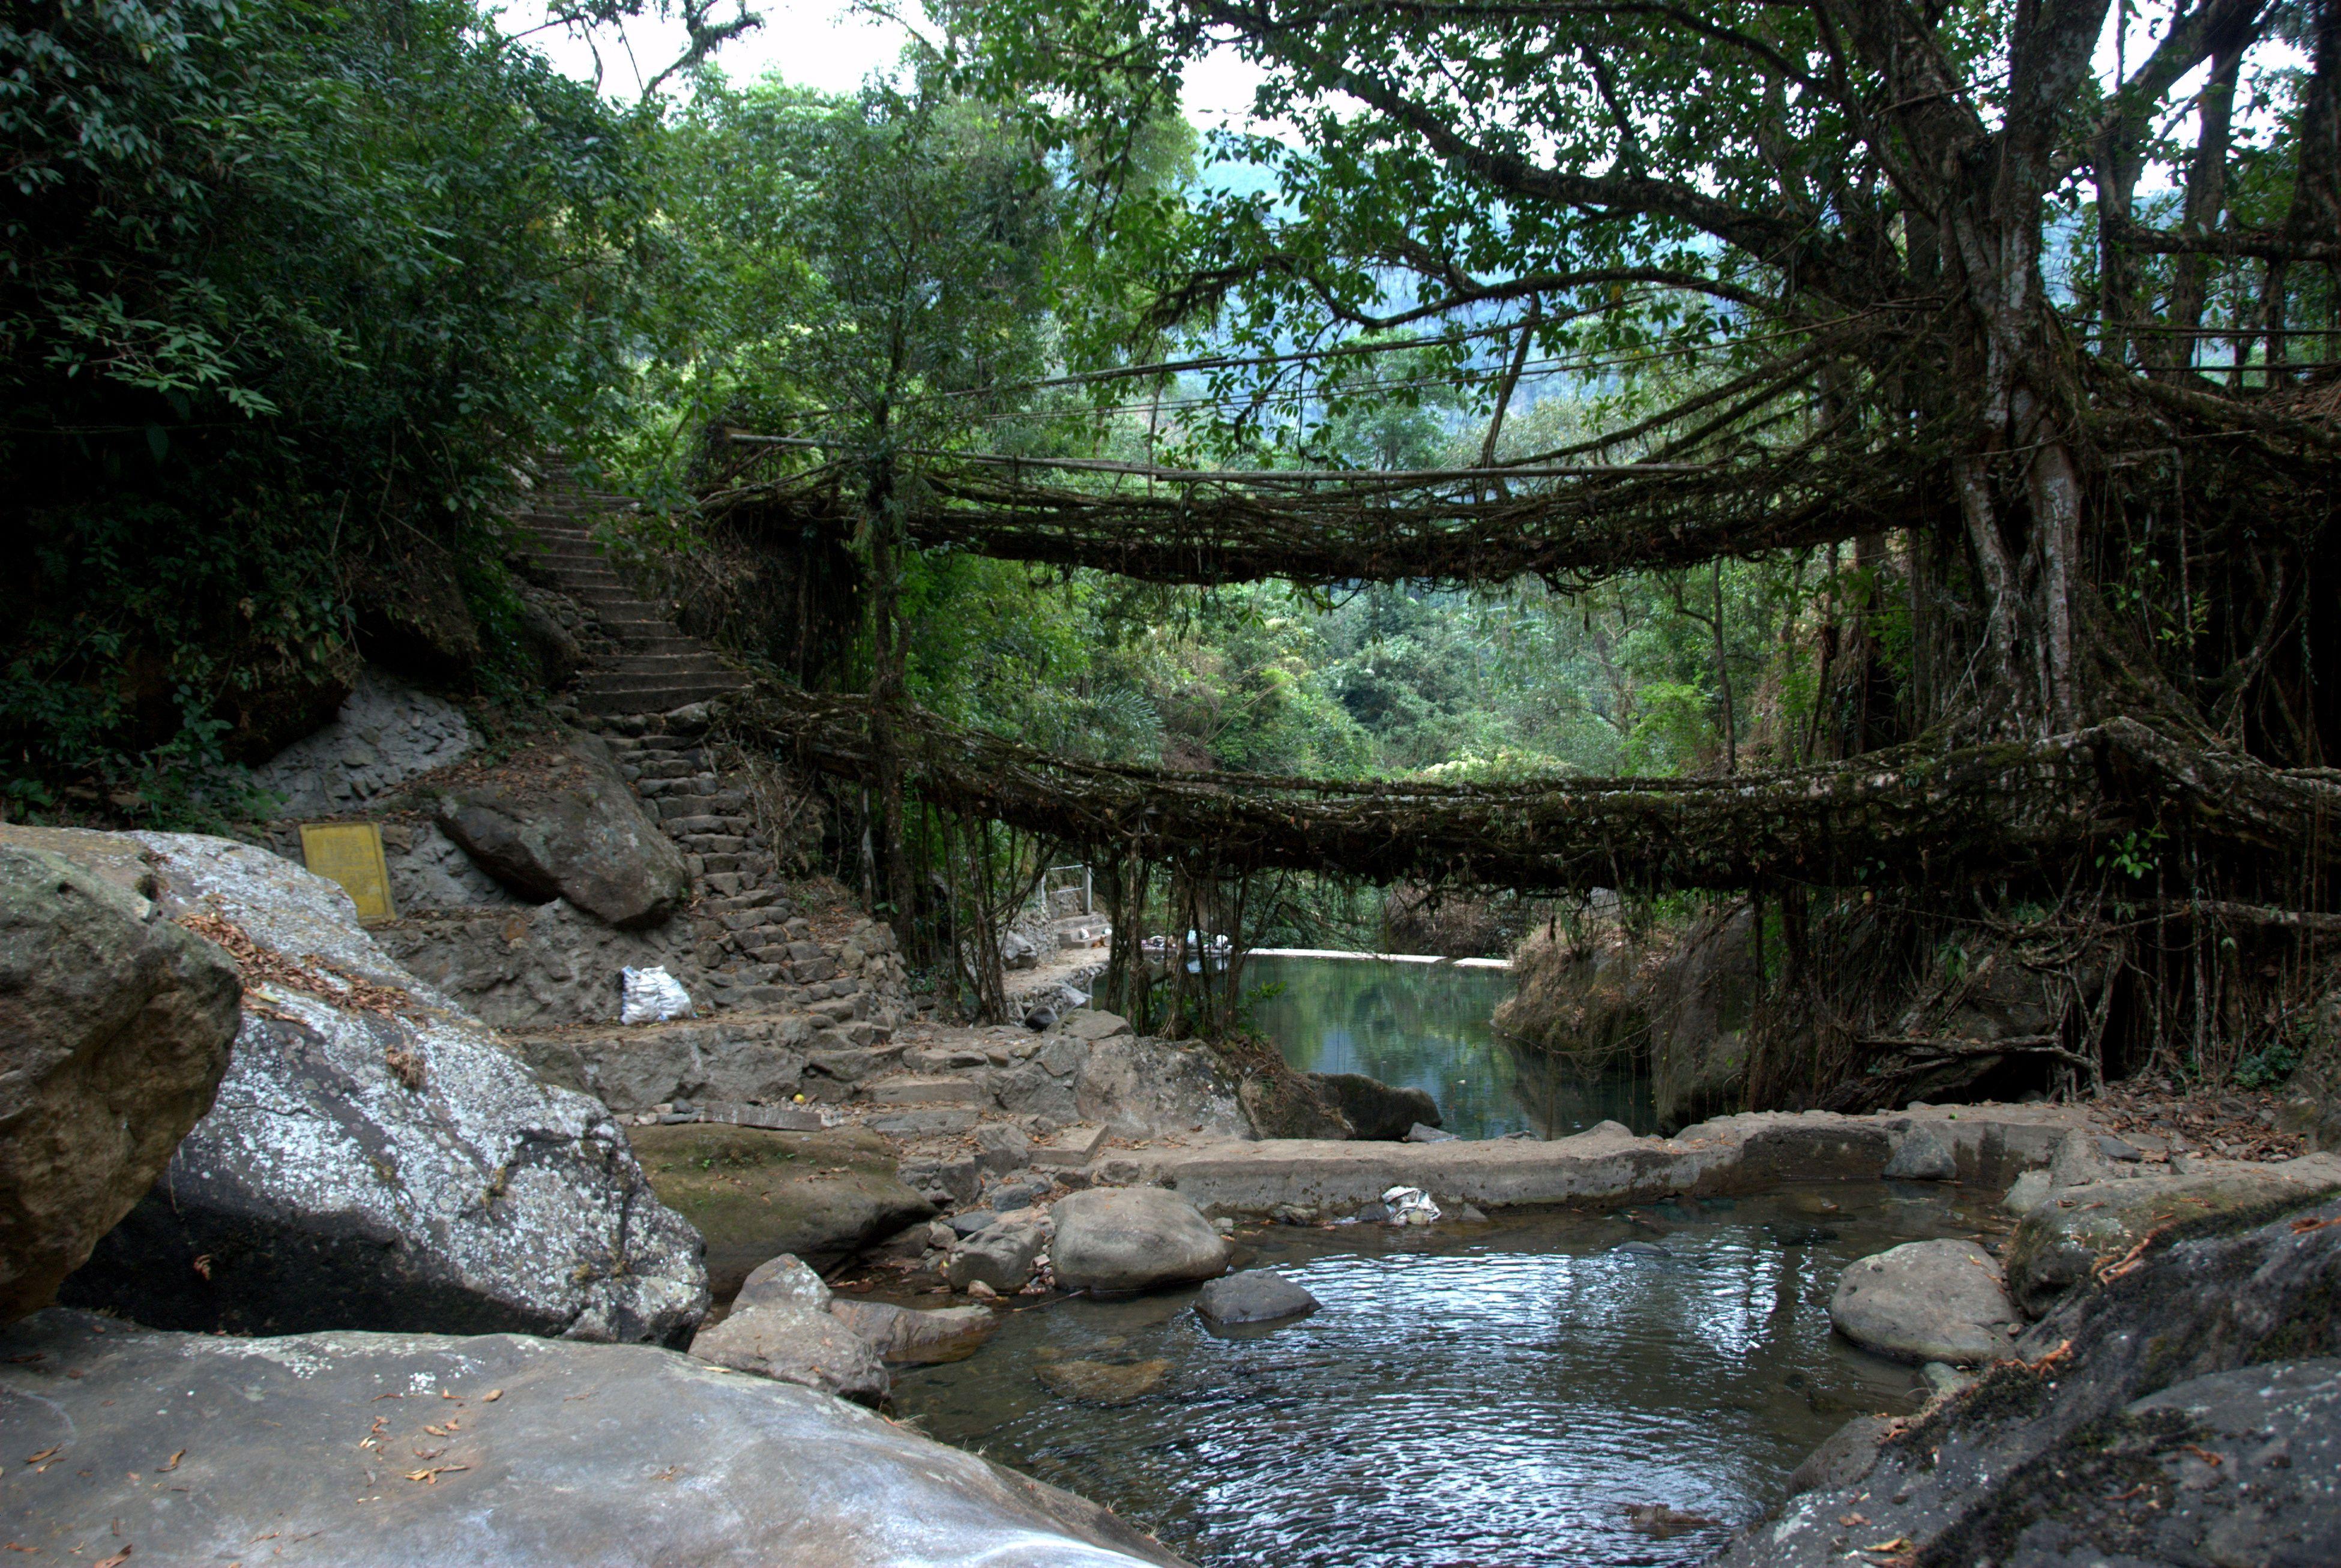 living bridge meghalaya | A double decker living bridge in Meghalaya,